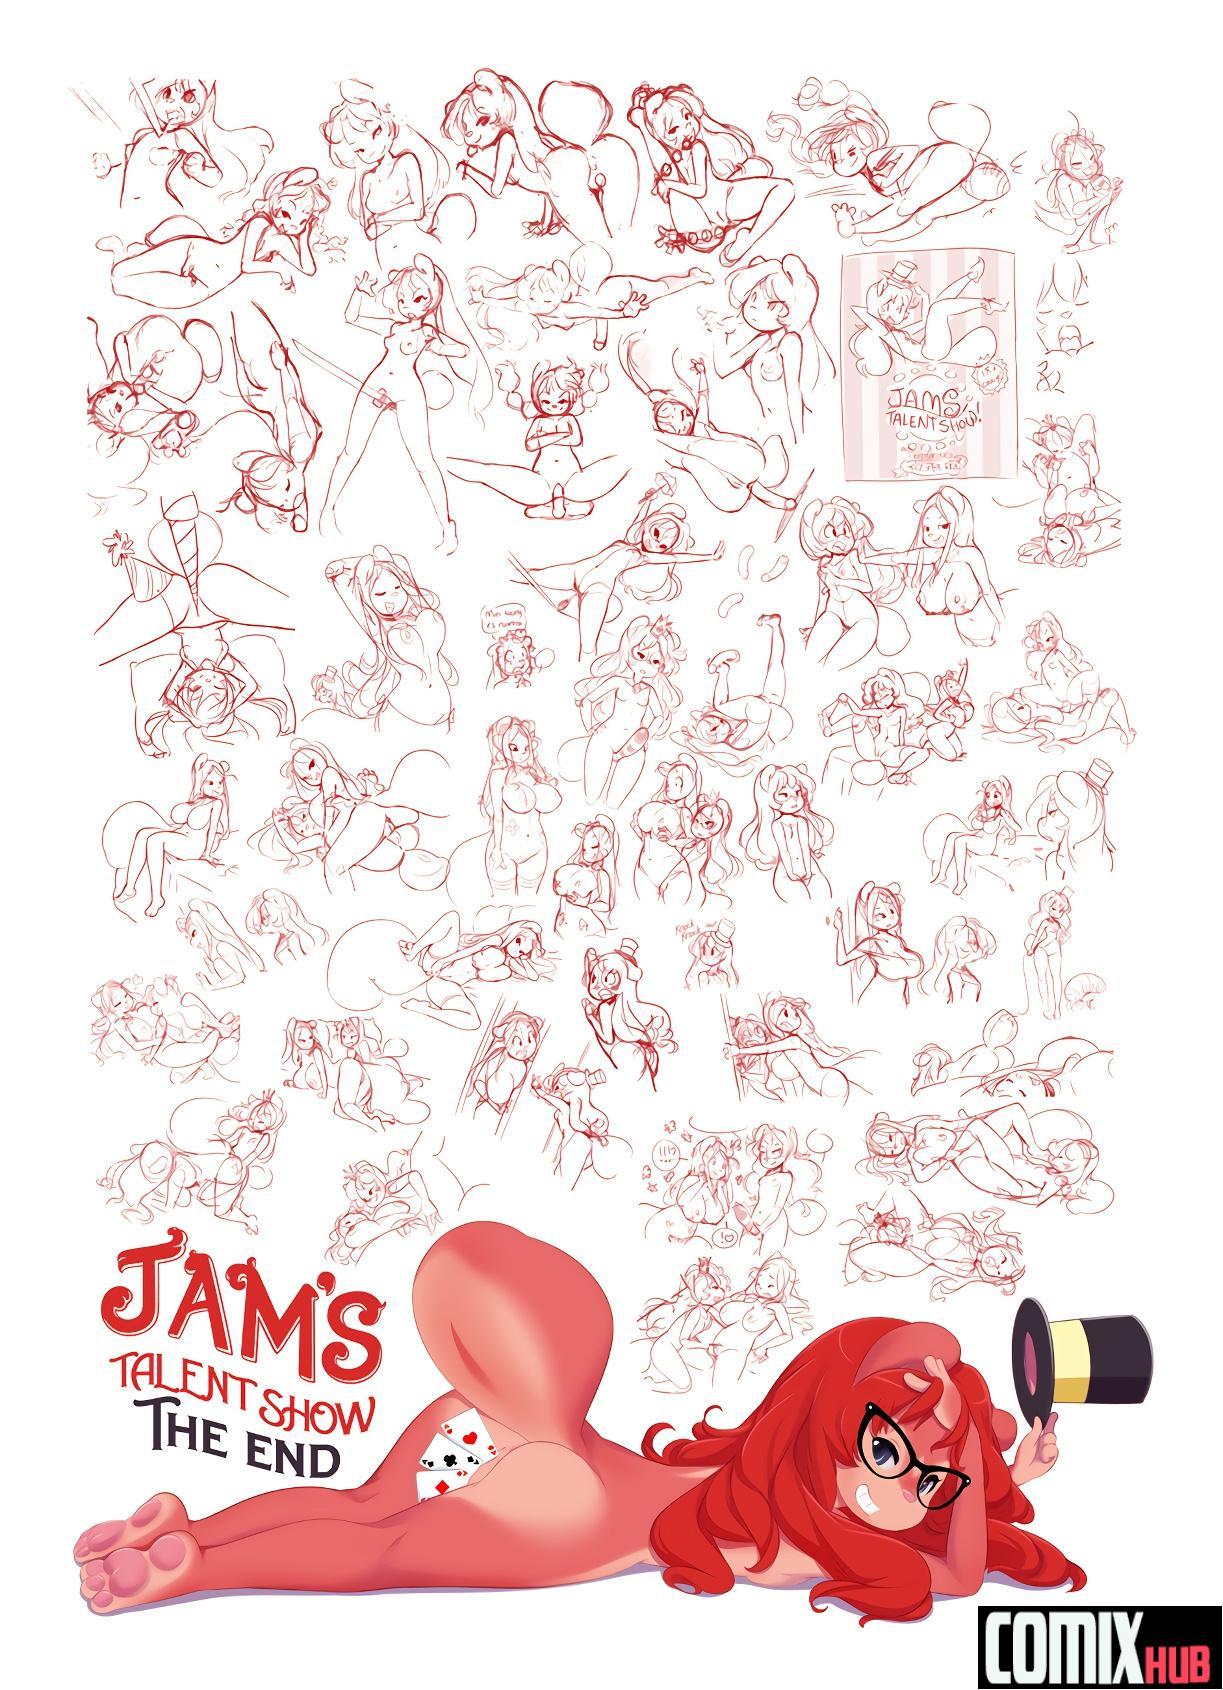 Porn comics, Jam's Talent Show Oral sex, Anal Sex, Big Tits, Comedy, fingering, Furry, Lesbians, Masturbation, Sex Toys, Stockings